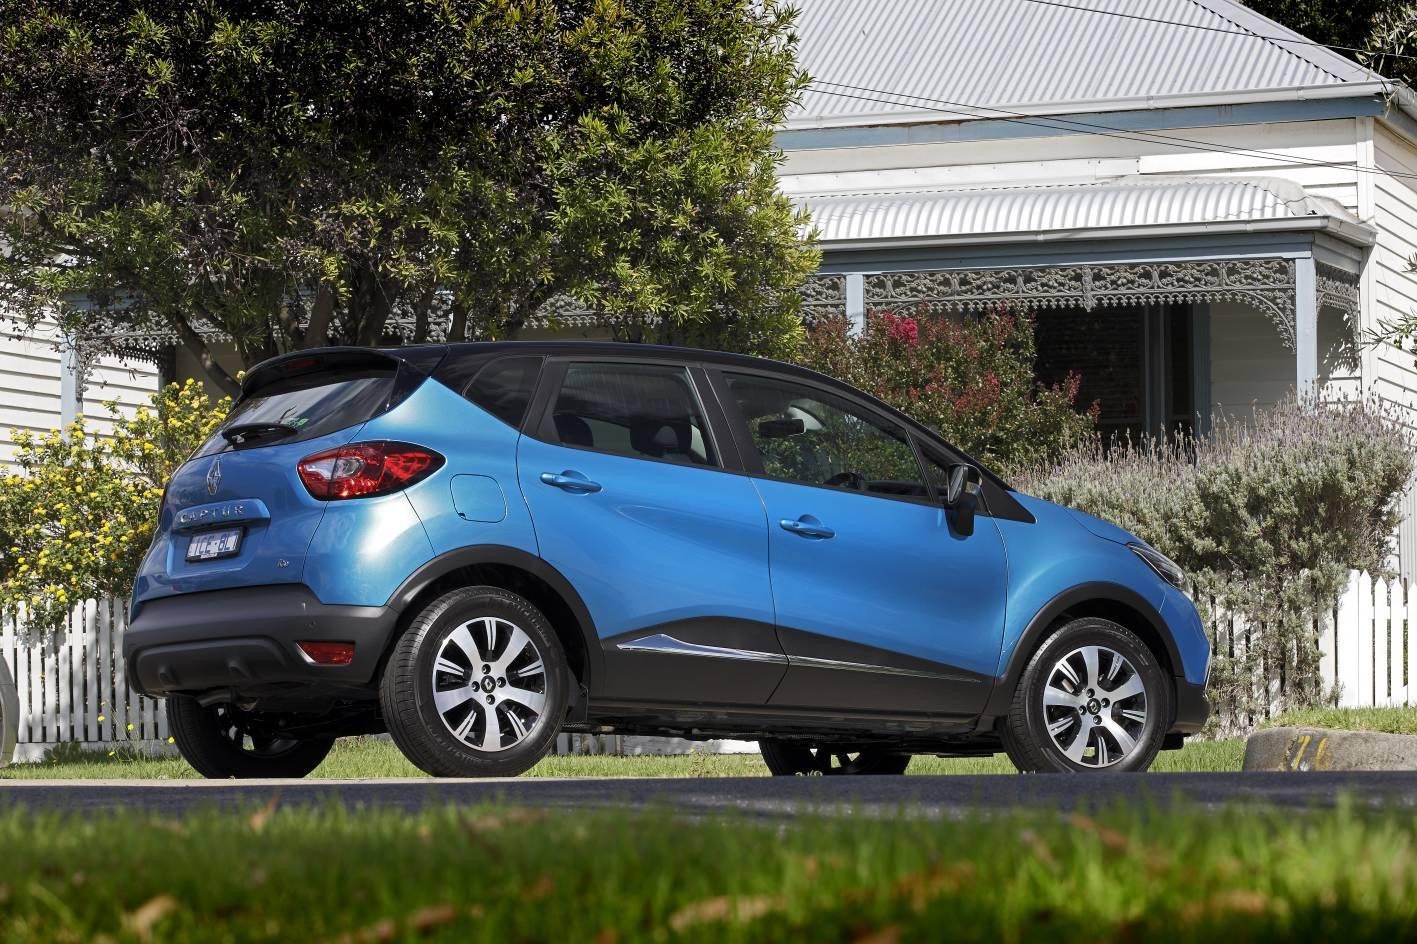 Renault Cars News Renault Captur Small Suv On Sale Now